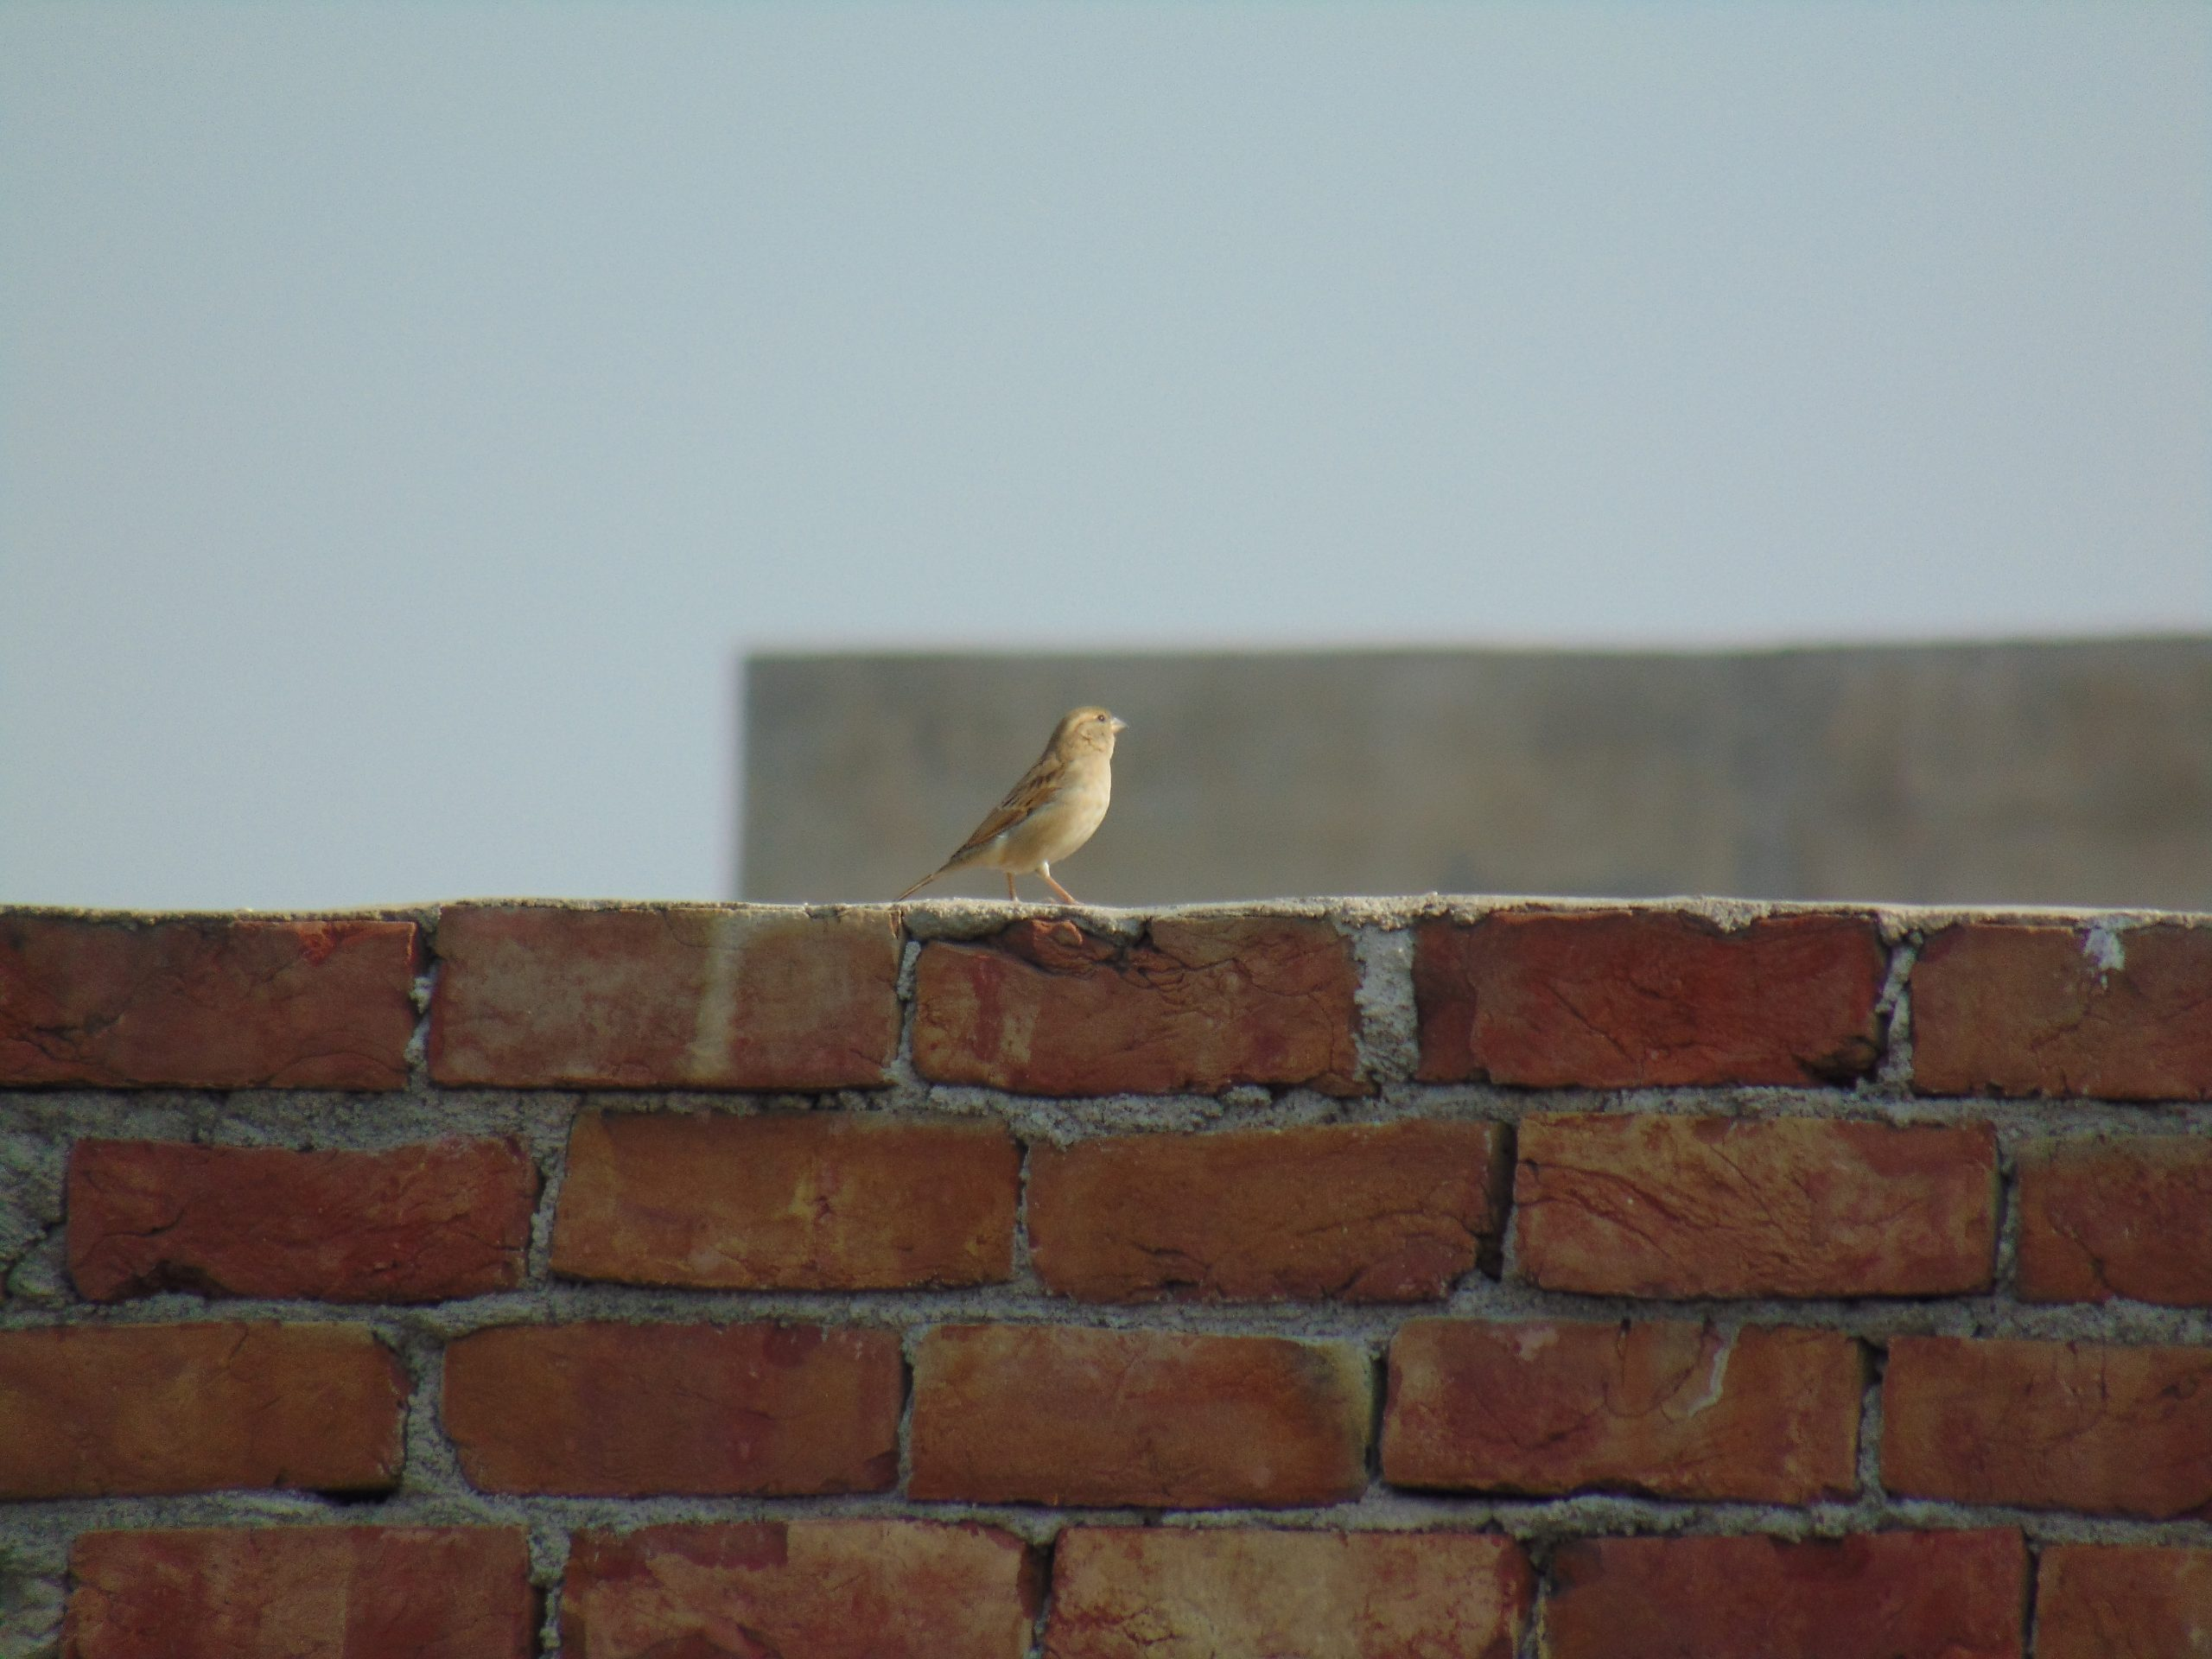 A bird on brick wall